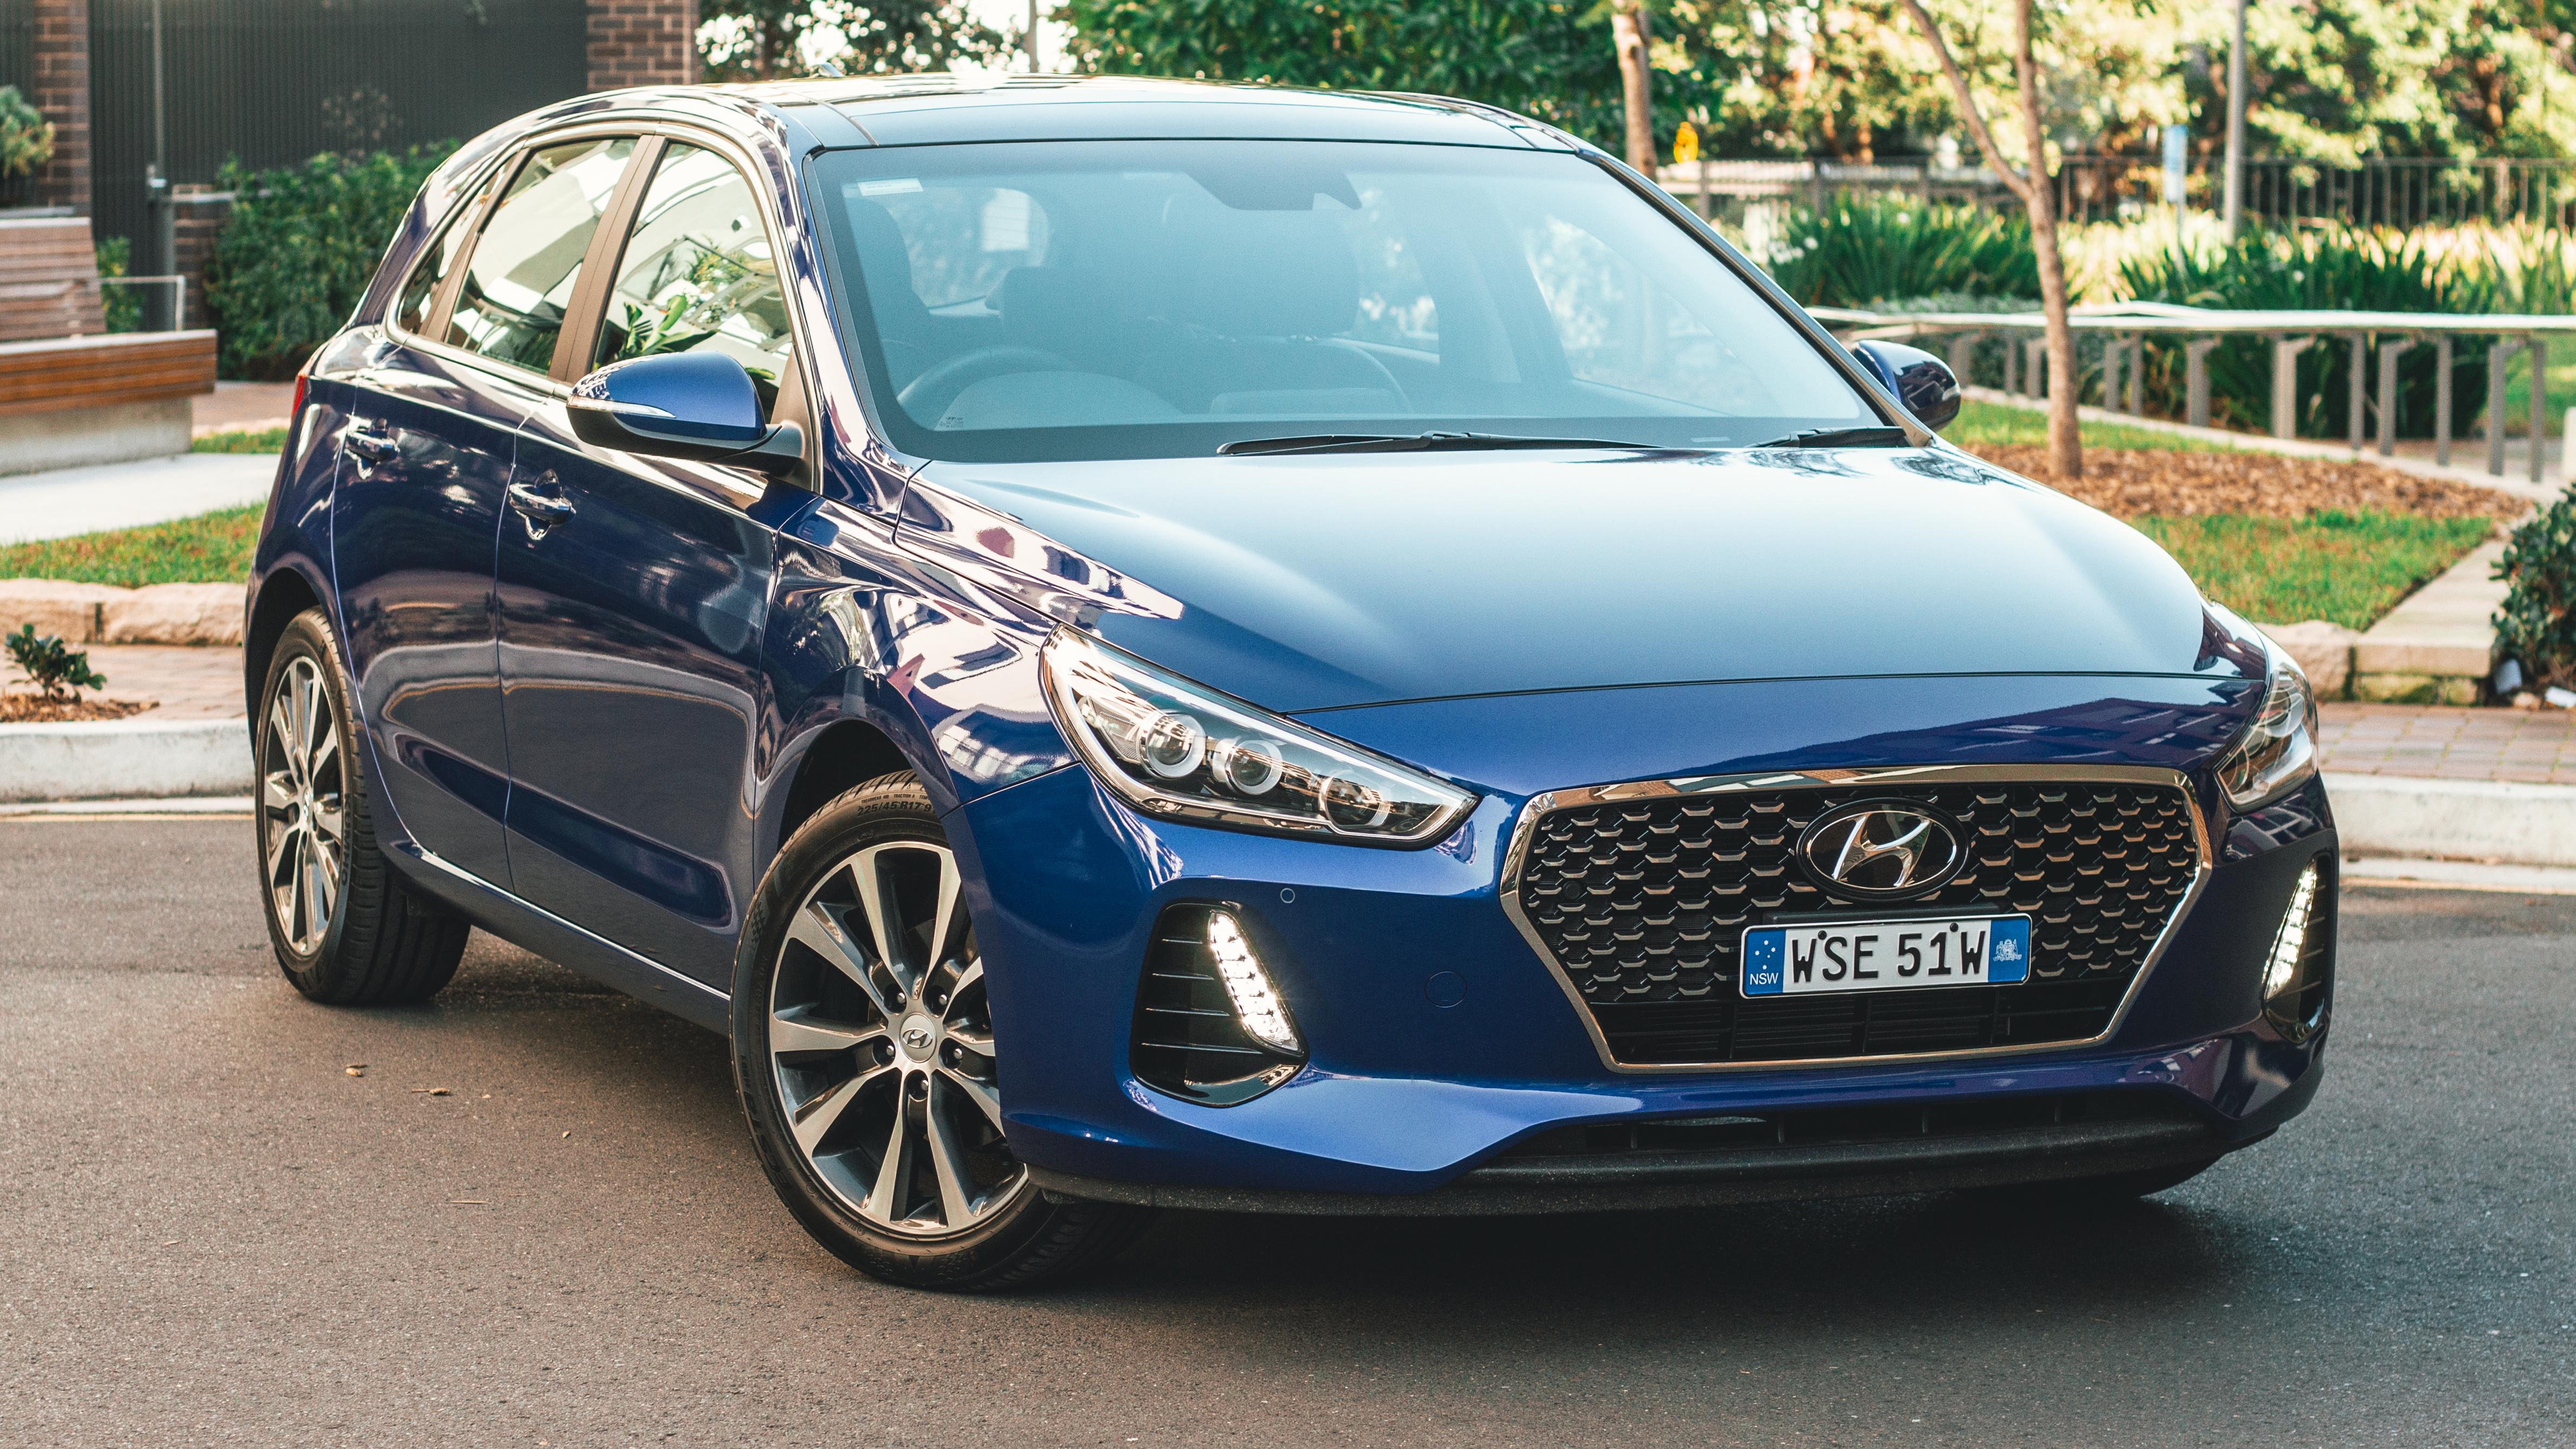 2020 Hyundai i30 Premium review